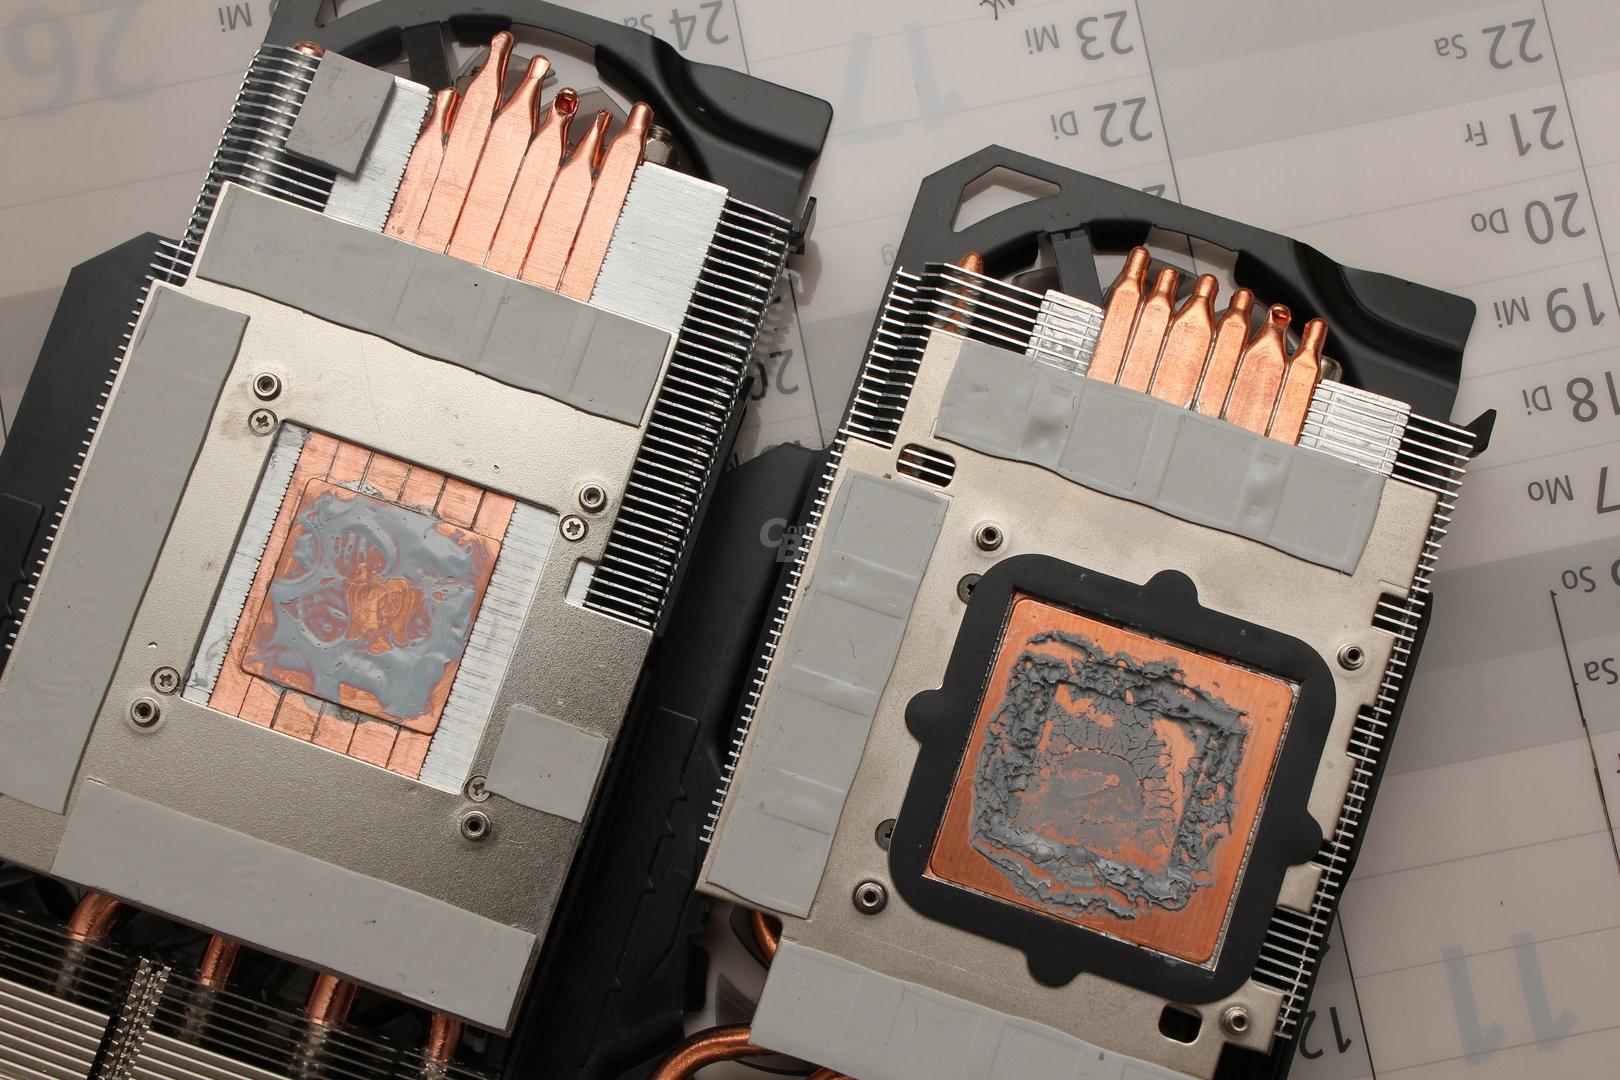 WindForce 3X: links R9 290X, rechts GTX 780 Ti